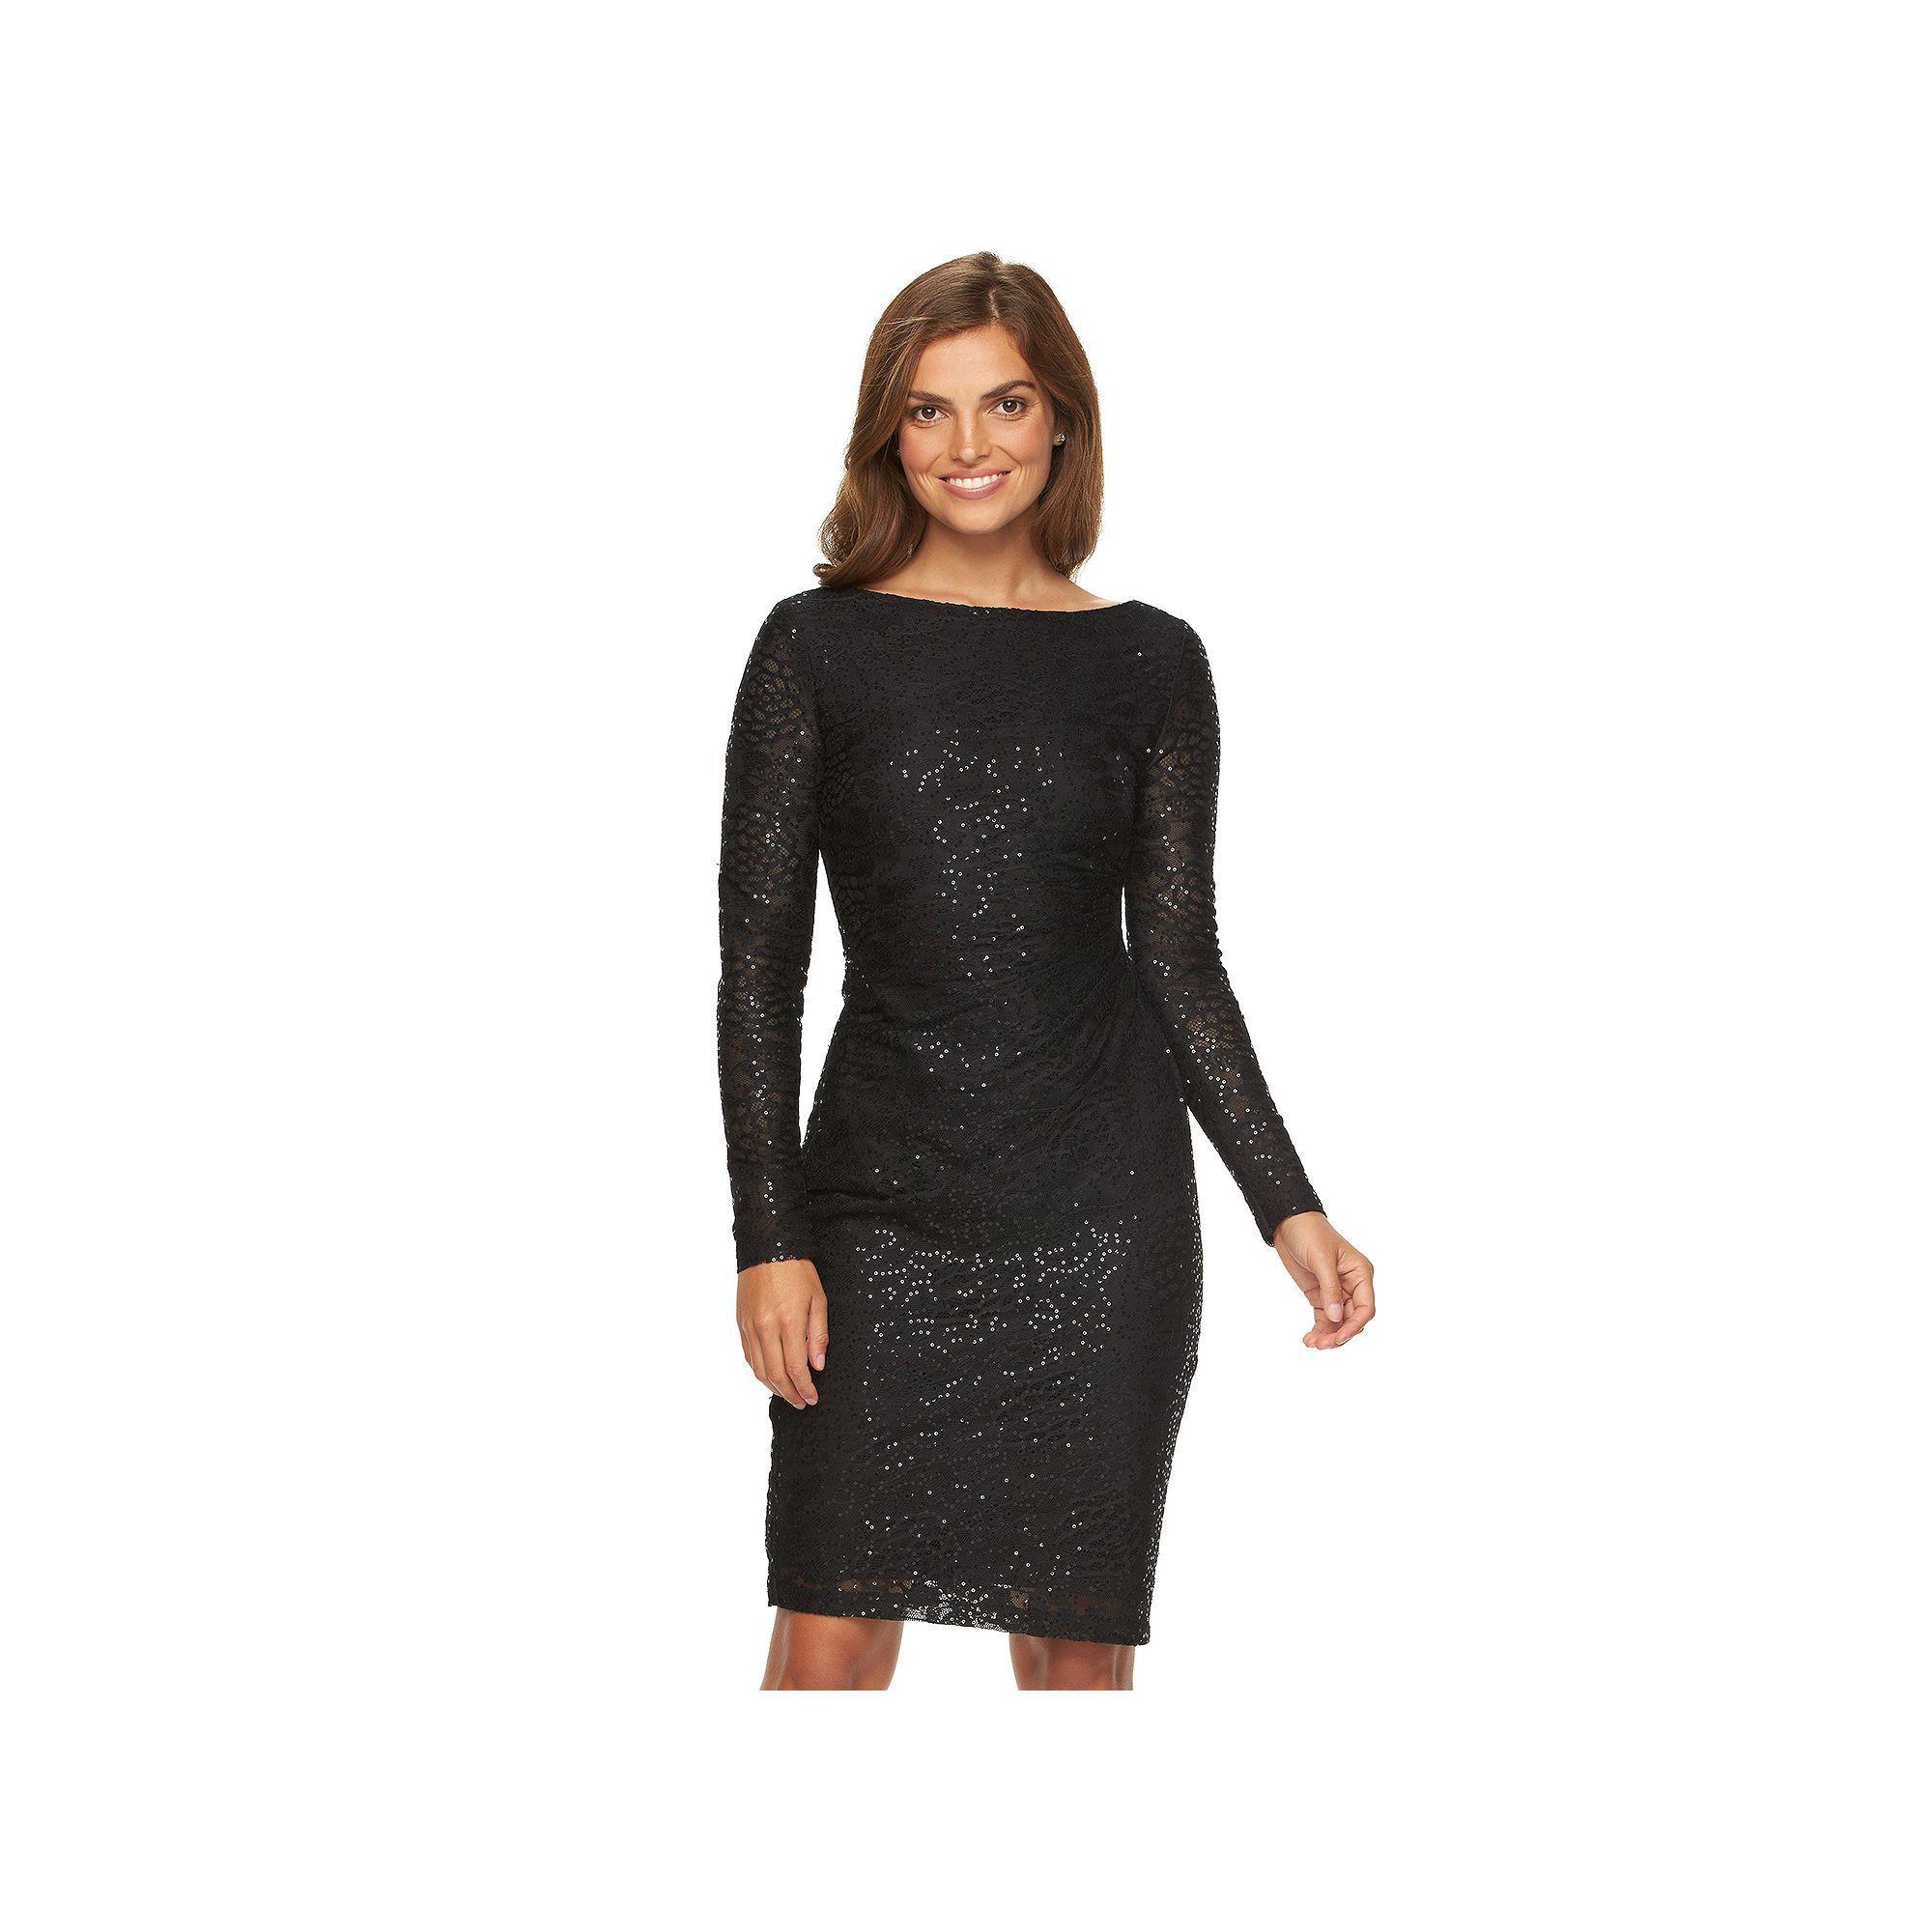 21613119087 Women s Chaps Lace Sequin Sheath Evening Dress